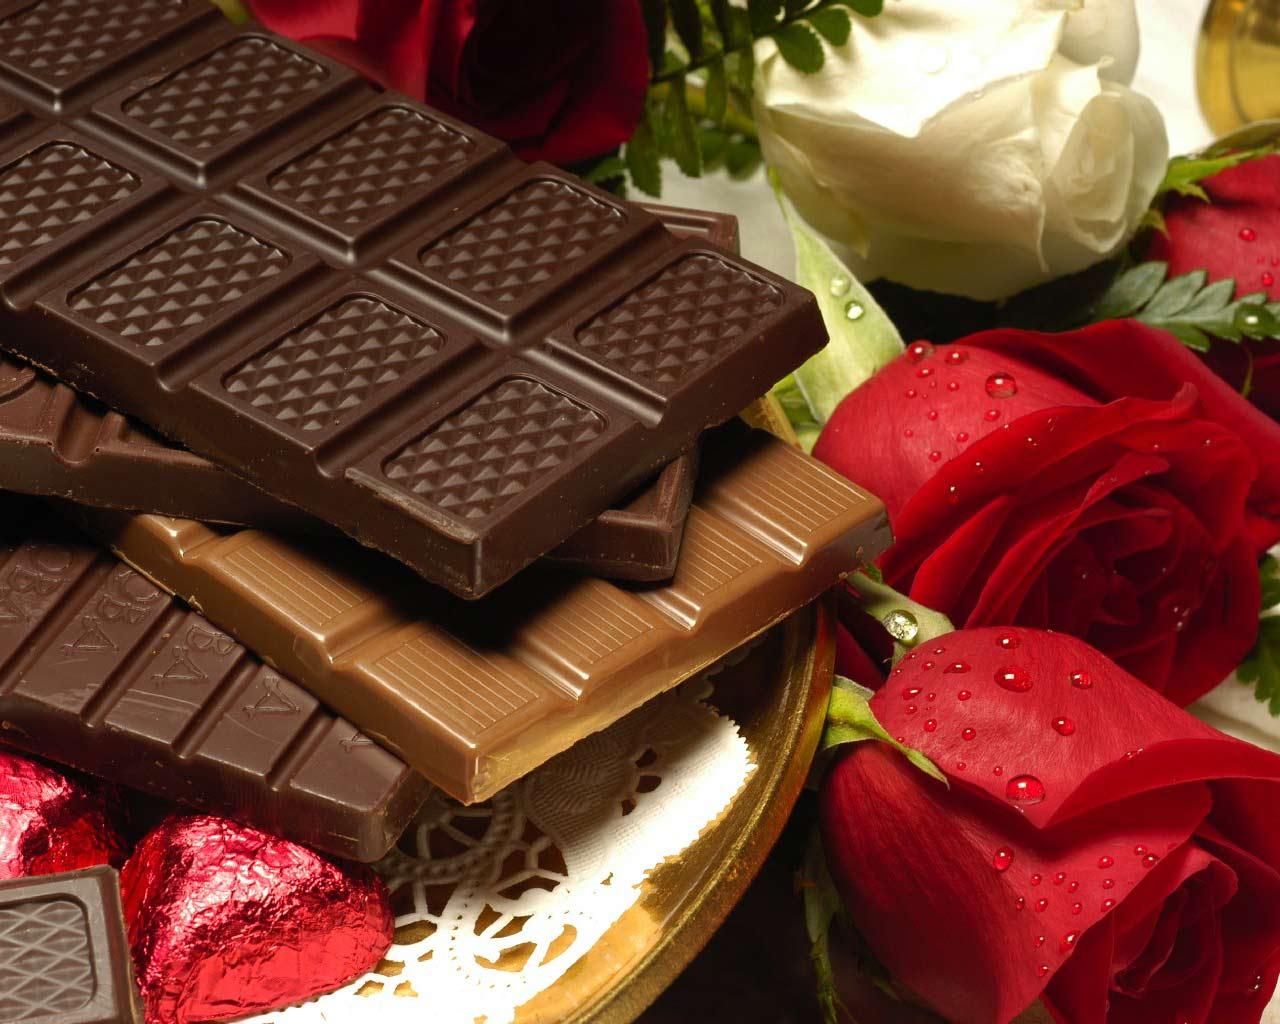 http://3.bp.blogspot.com/-7wUhOWhKoVA/TzAvIJWwz7I/AAAAAAAABEY/imWP4Uvc8wQ/s1600/6-Chocolate+Day+1280x1024.jpg